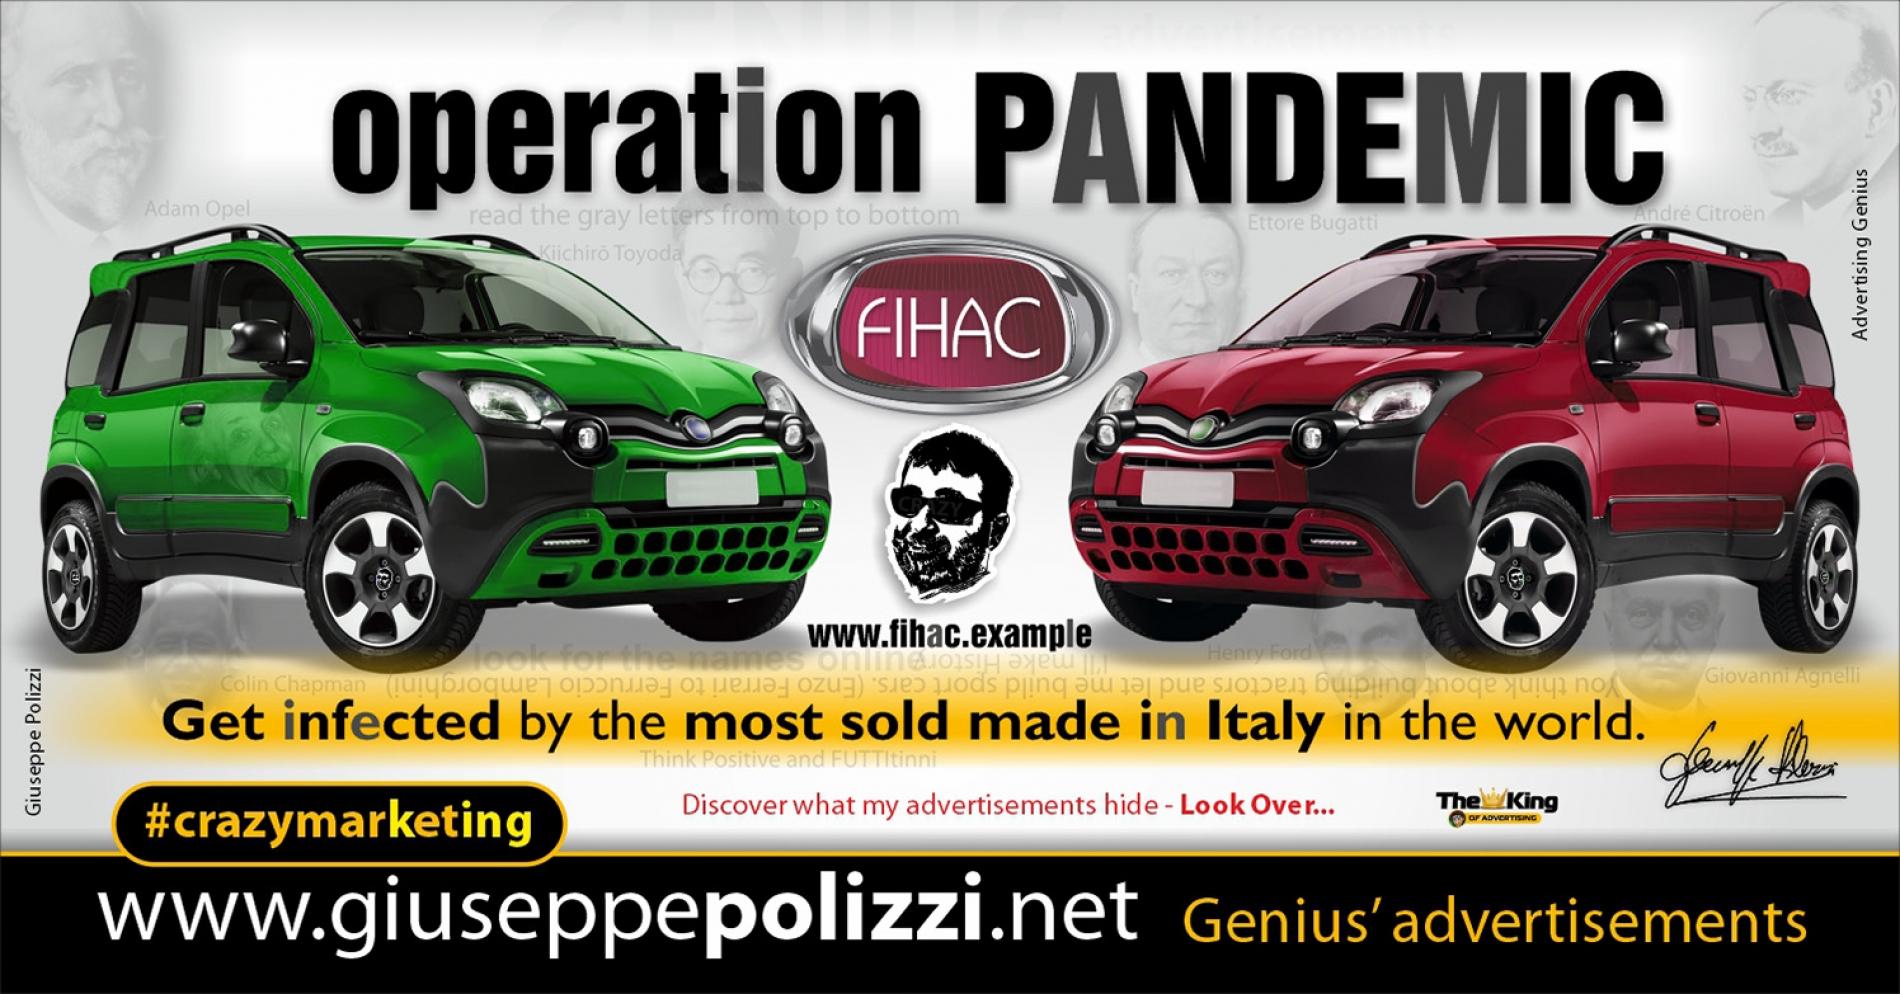 giuseppe polizzi advertising operation pandemic Crazy Marketing  2020